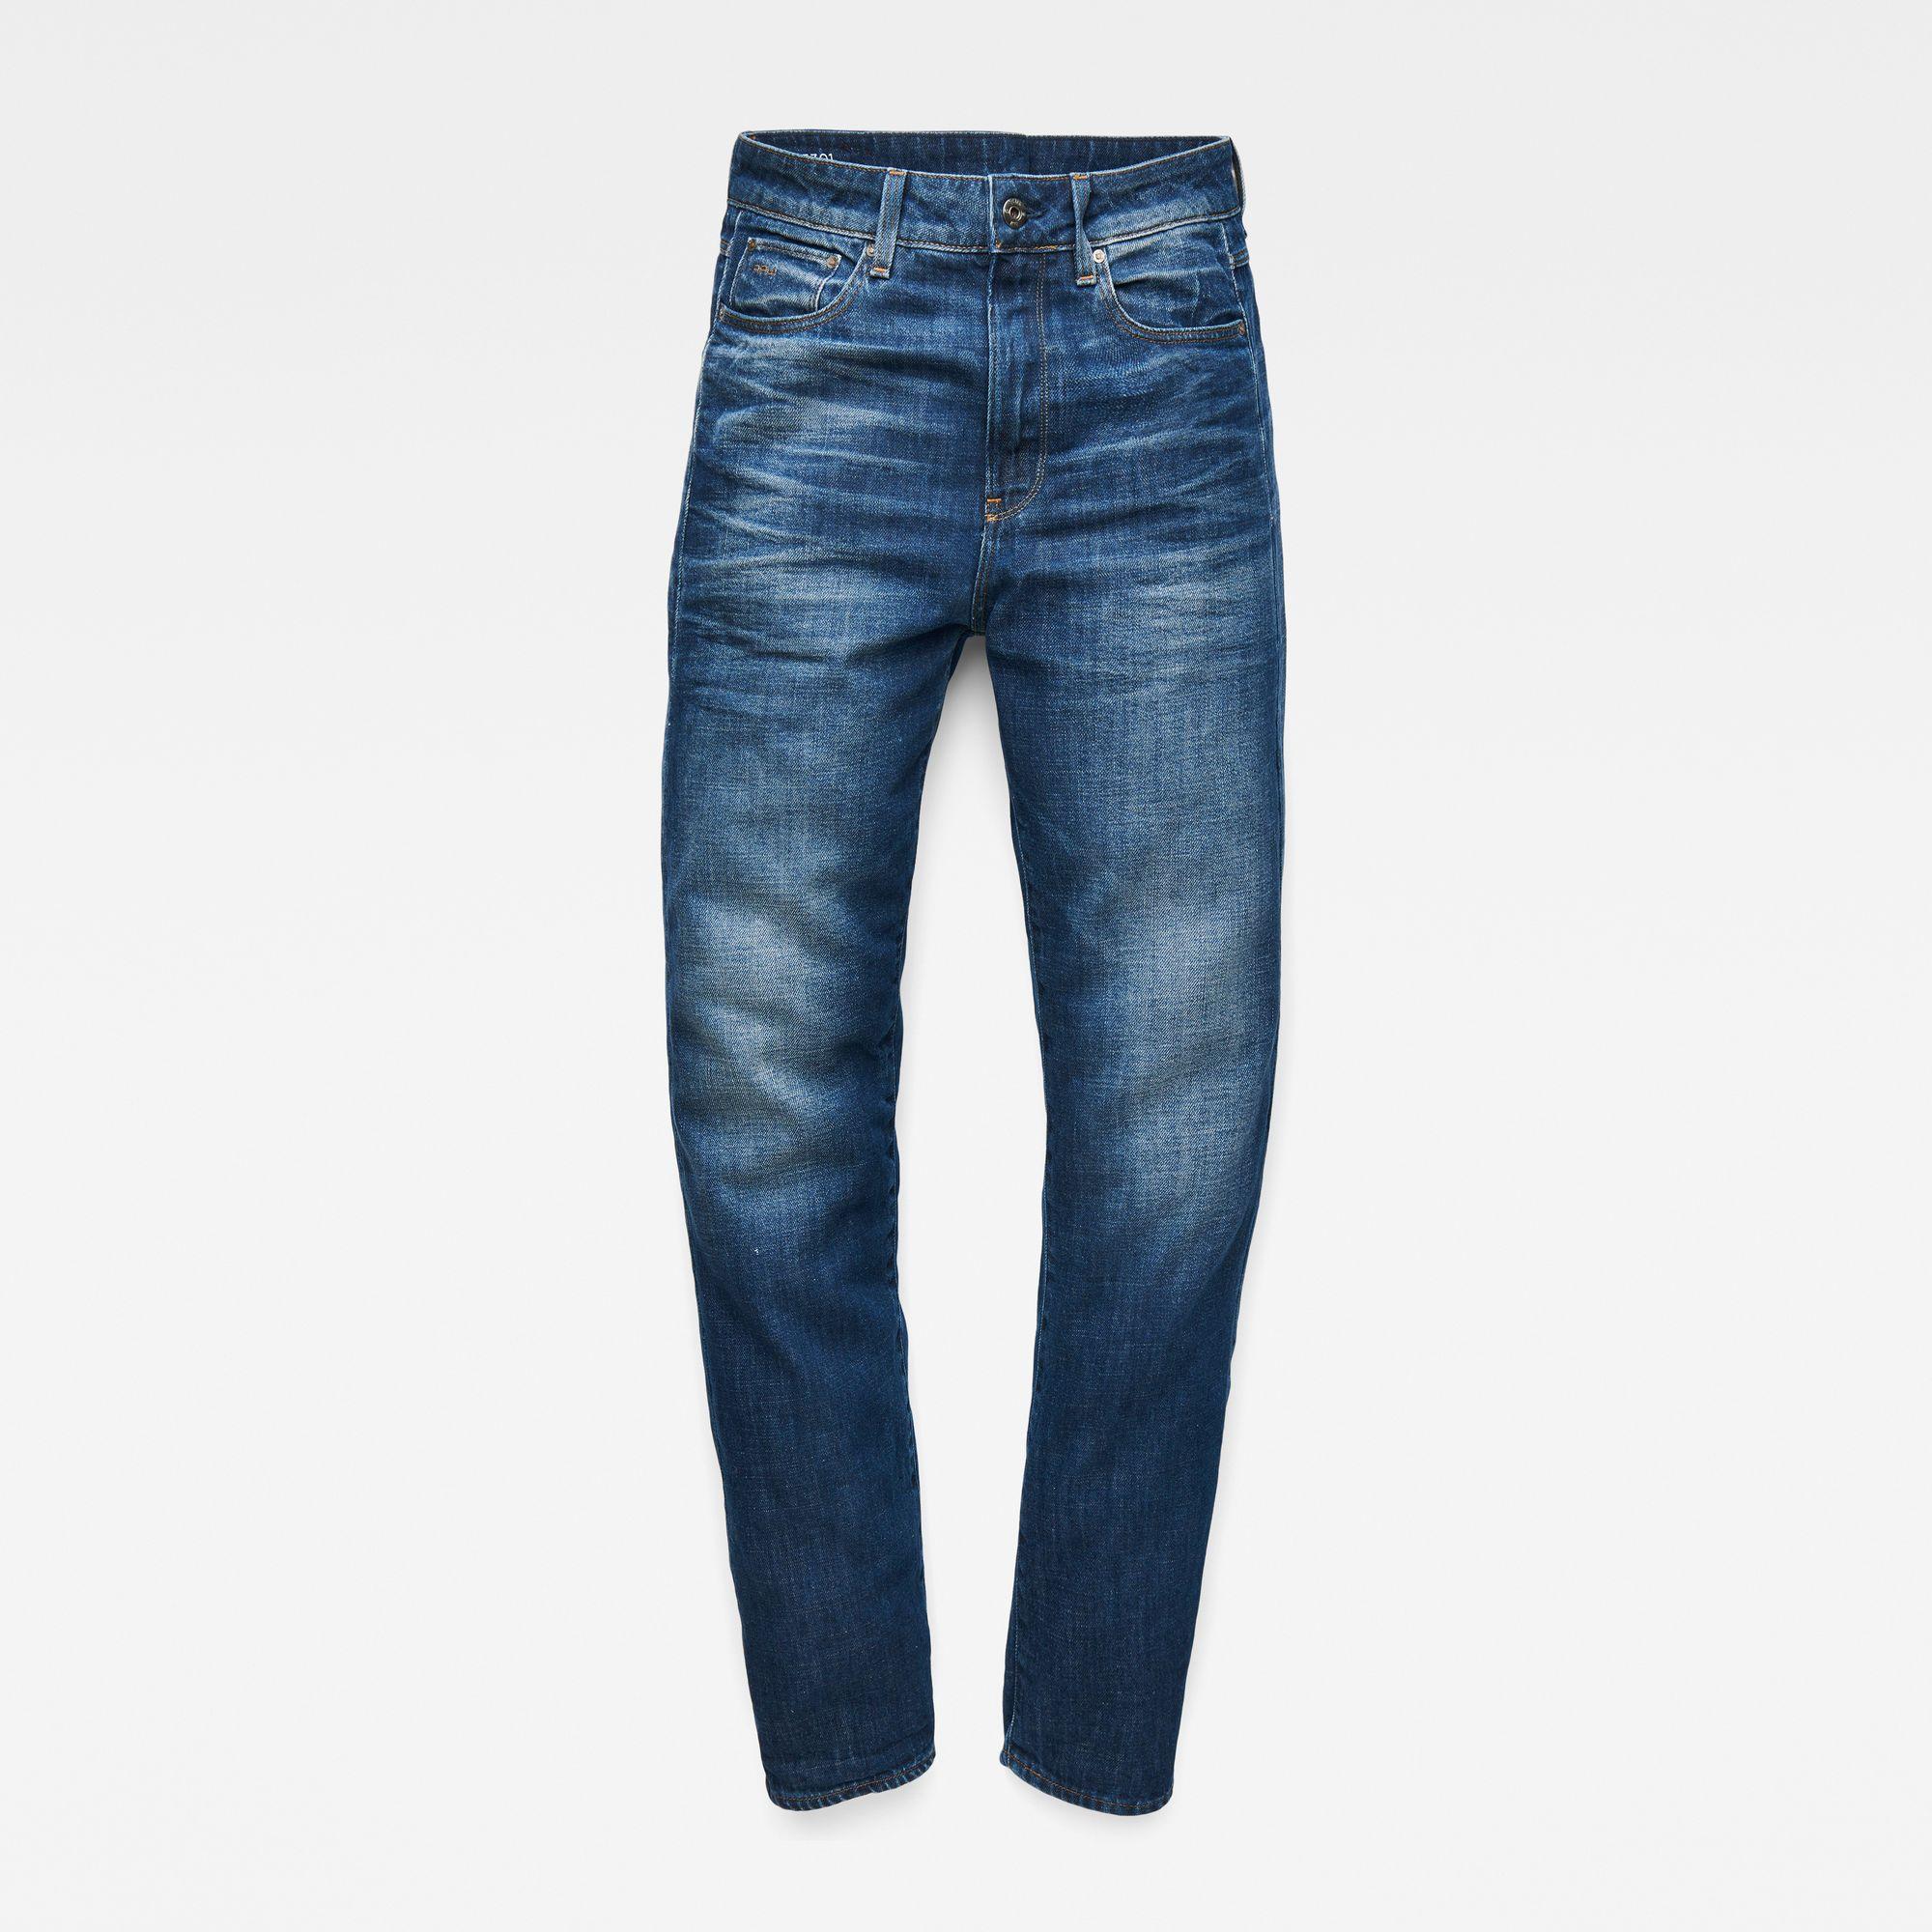 G-Star RAW 3301 Mid Waist Boyfriend Jeans